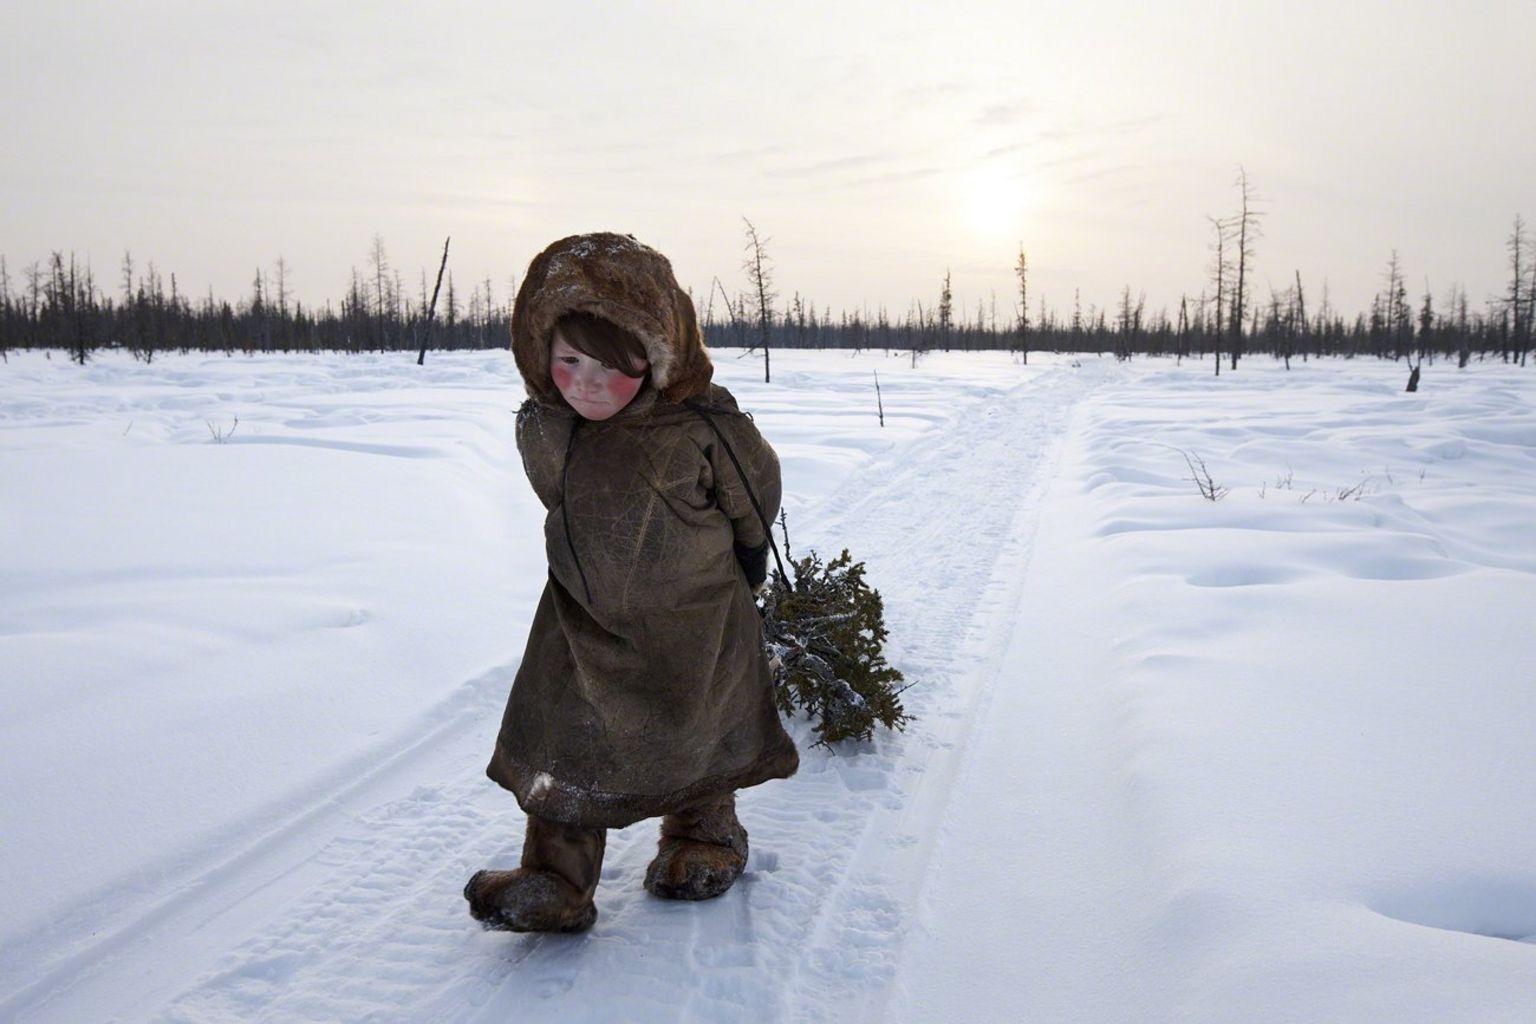 Nenet girl - Siberia, Russia